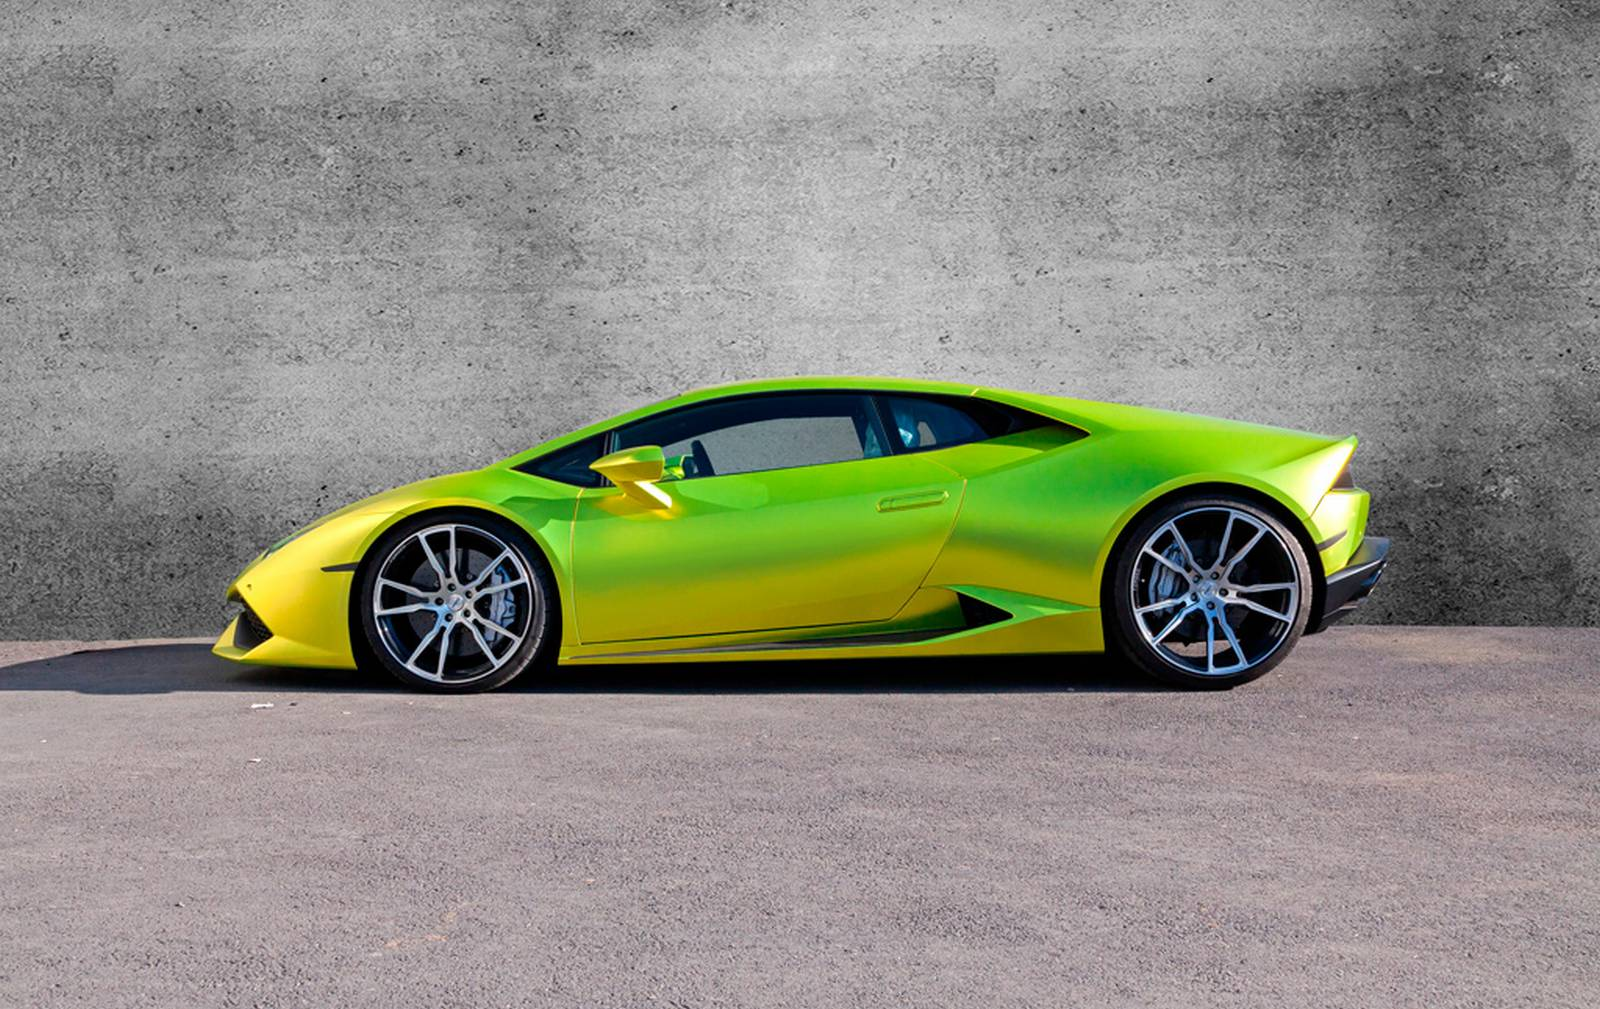 Official: Lamborghini Huracan by xXx Performance - GTspirit